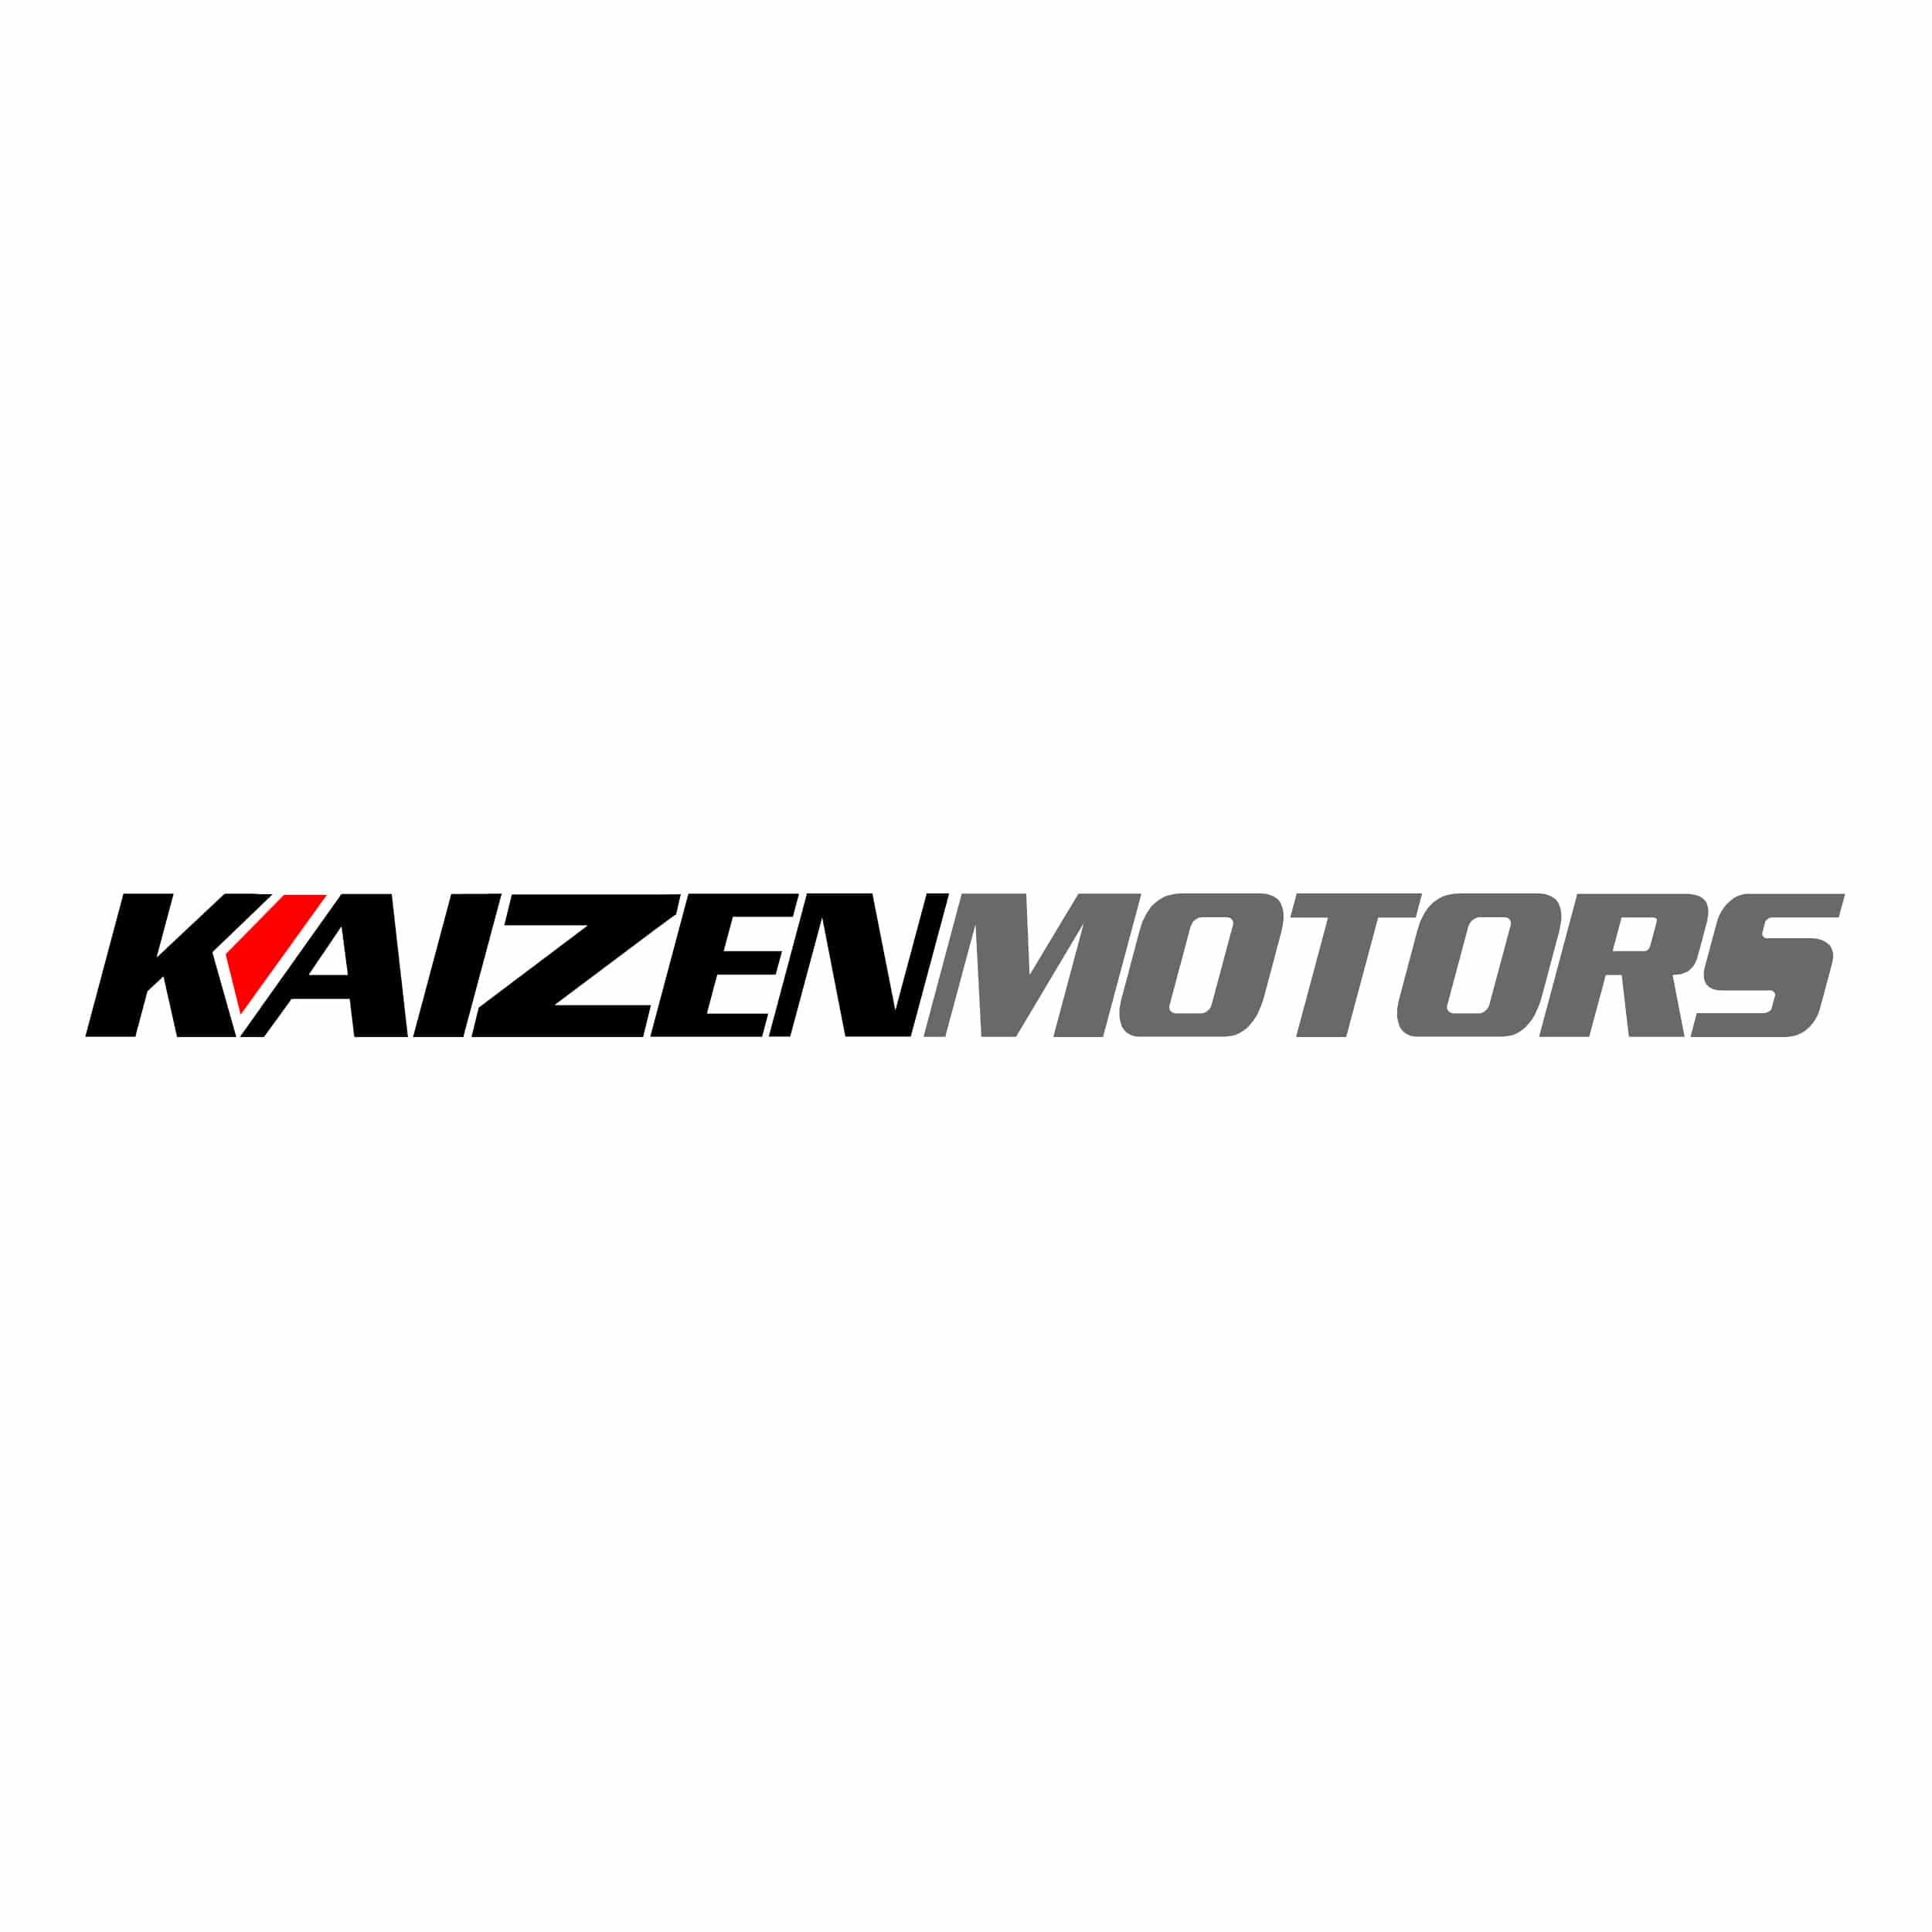 Kaizen Motors